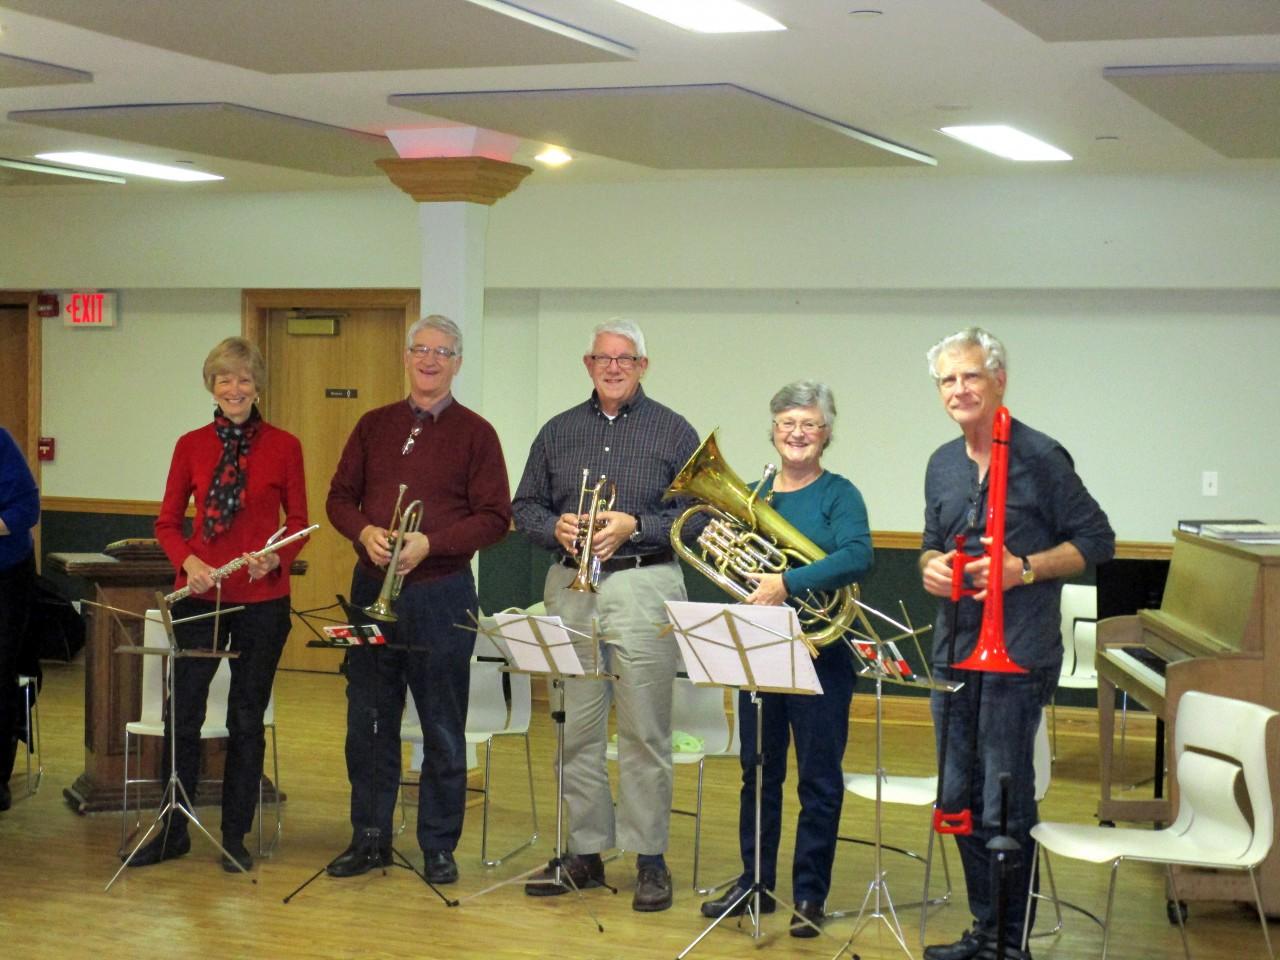 2015 Senior Christmas Celebration